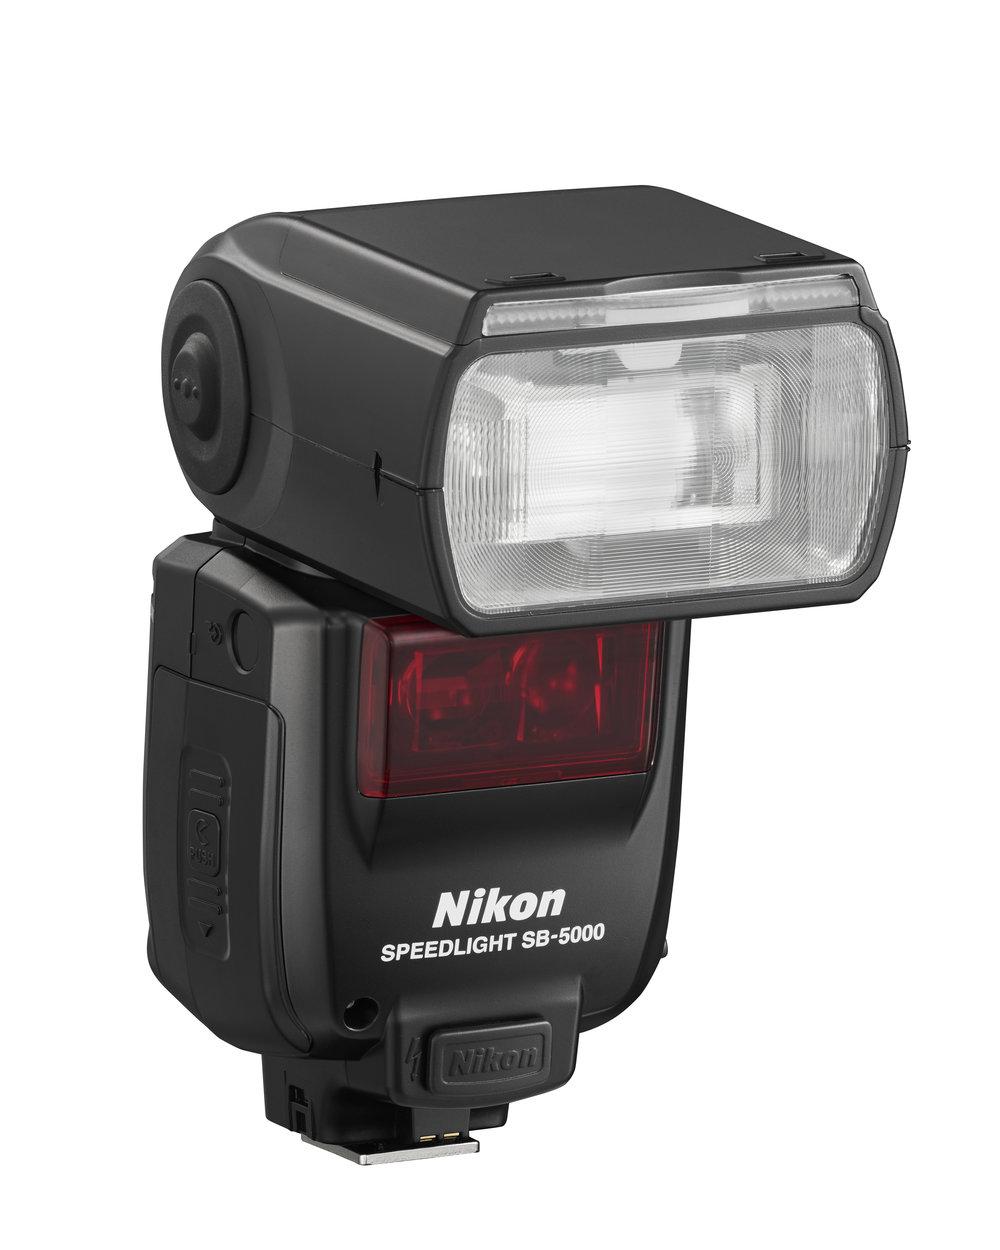 Nikon's radio/optical capable Speedlight, the SB5000